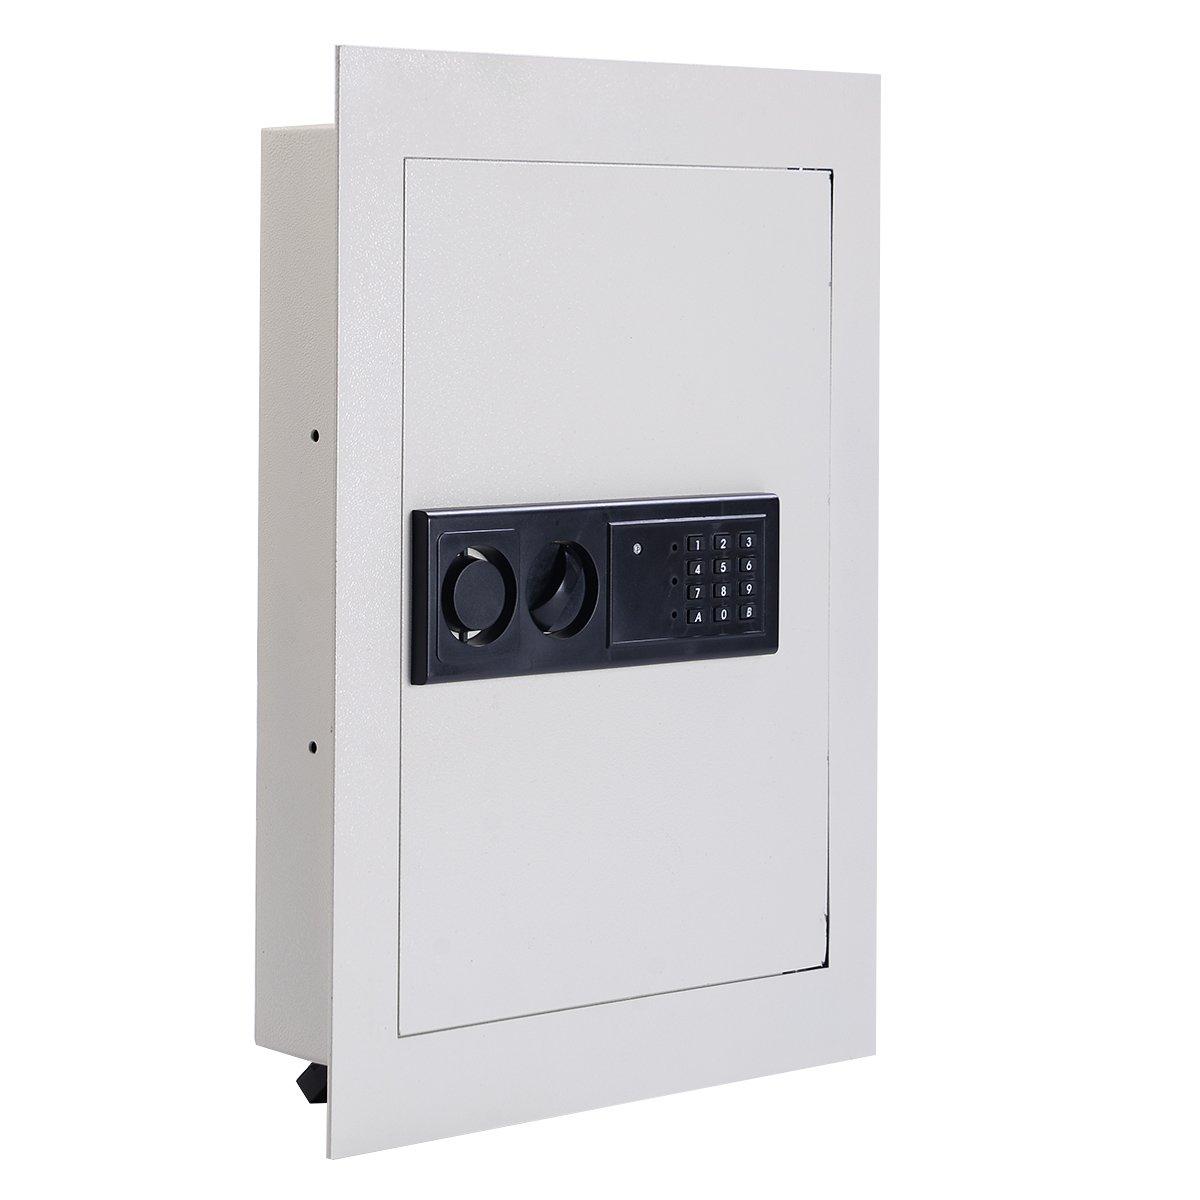 Giantex Electronic Wall Hidden Safe Security Box.83 CF Built-in Wall Electronic Flat Security Safety Cabinet by Giantex